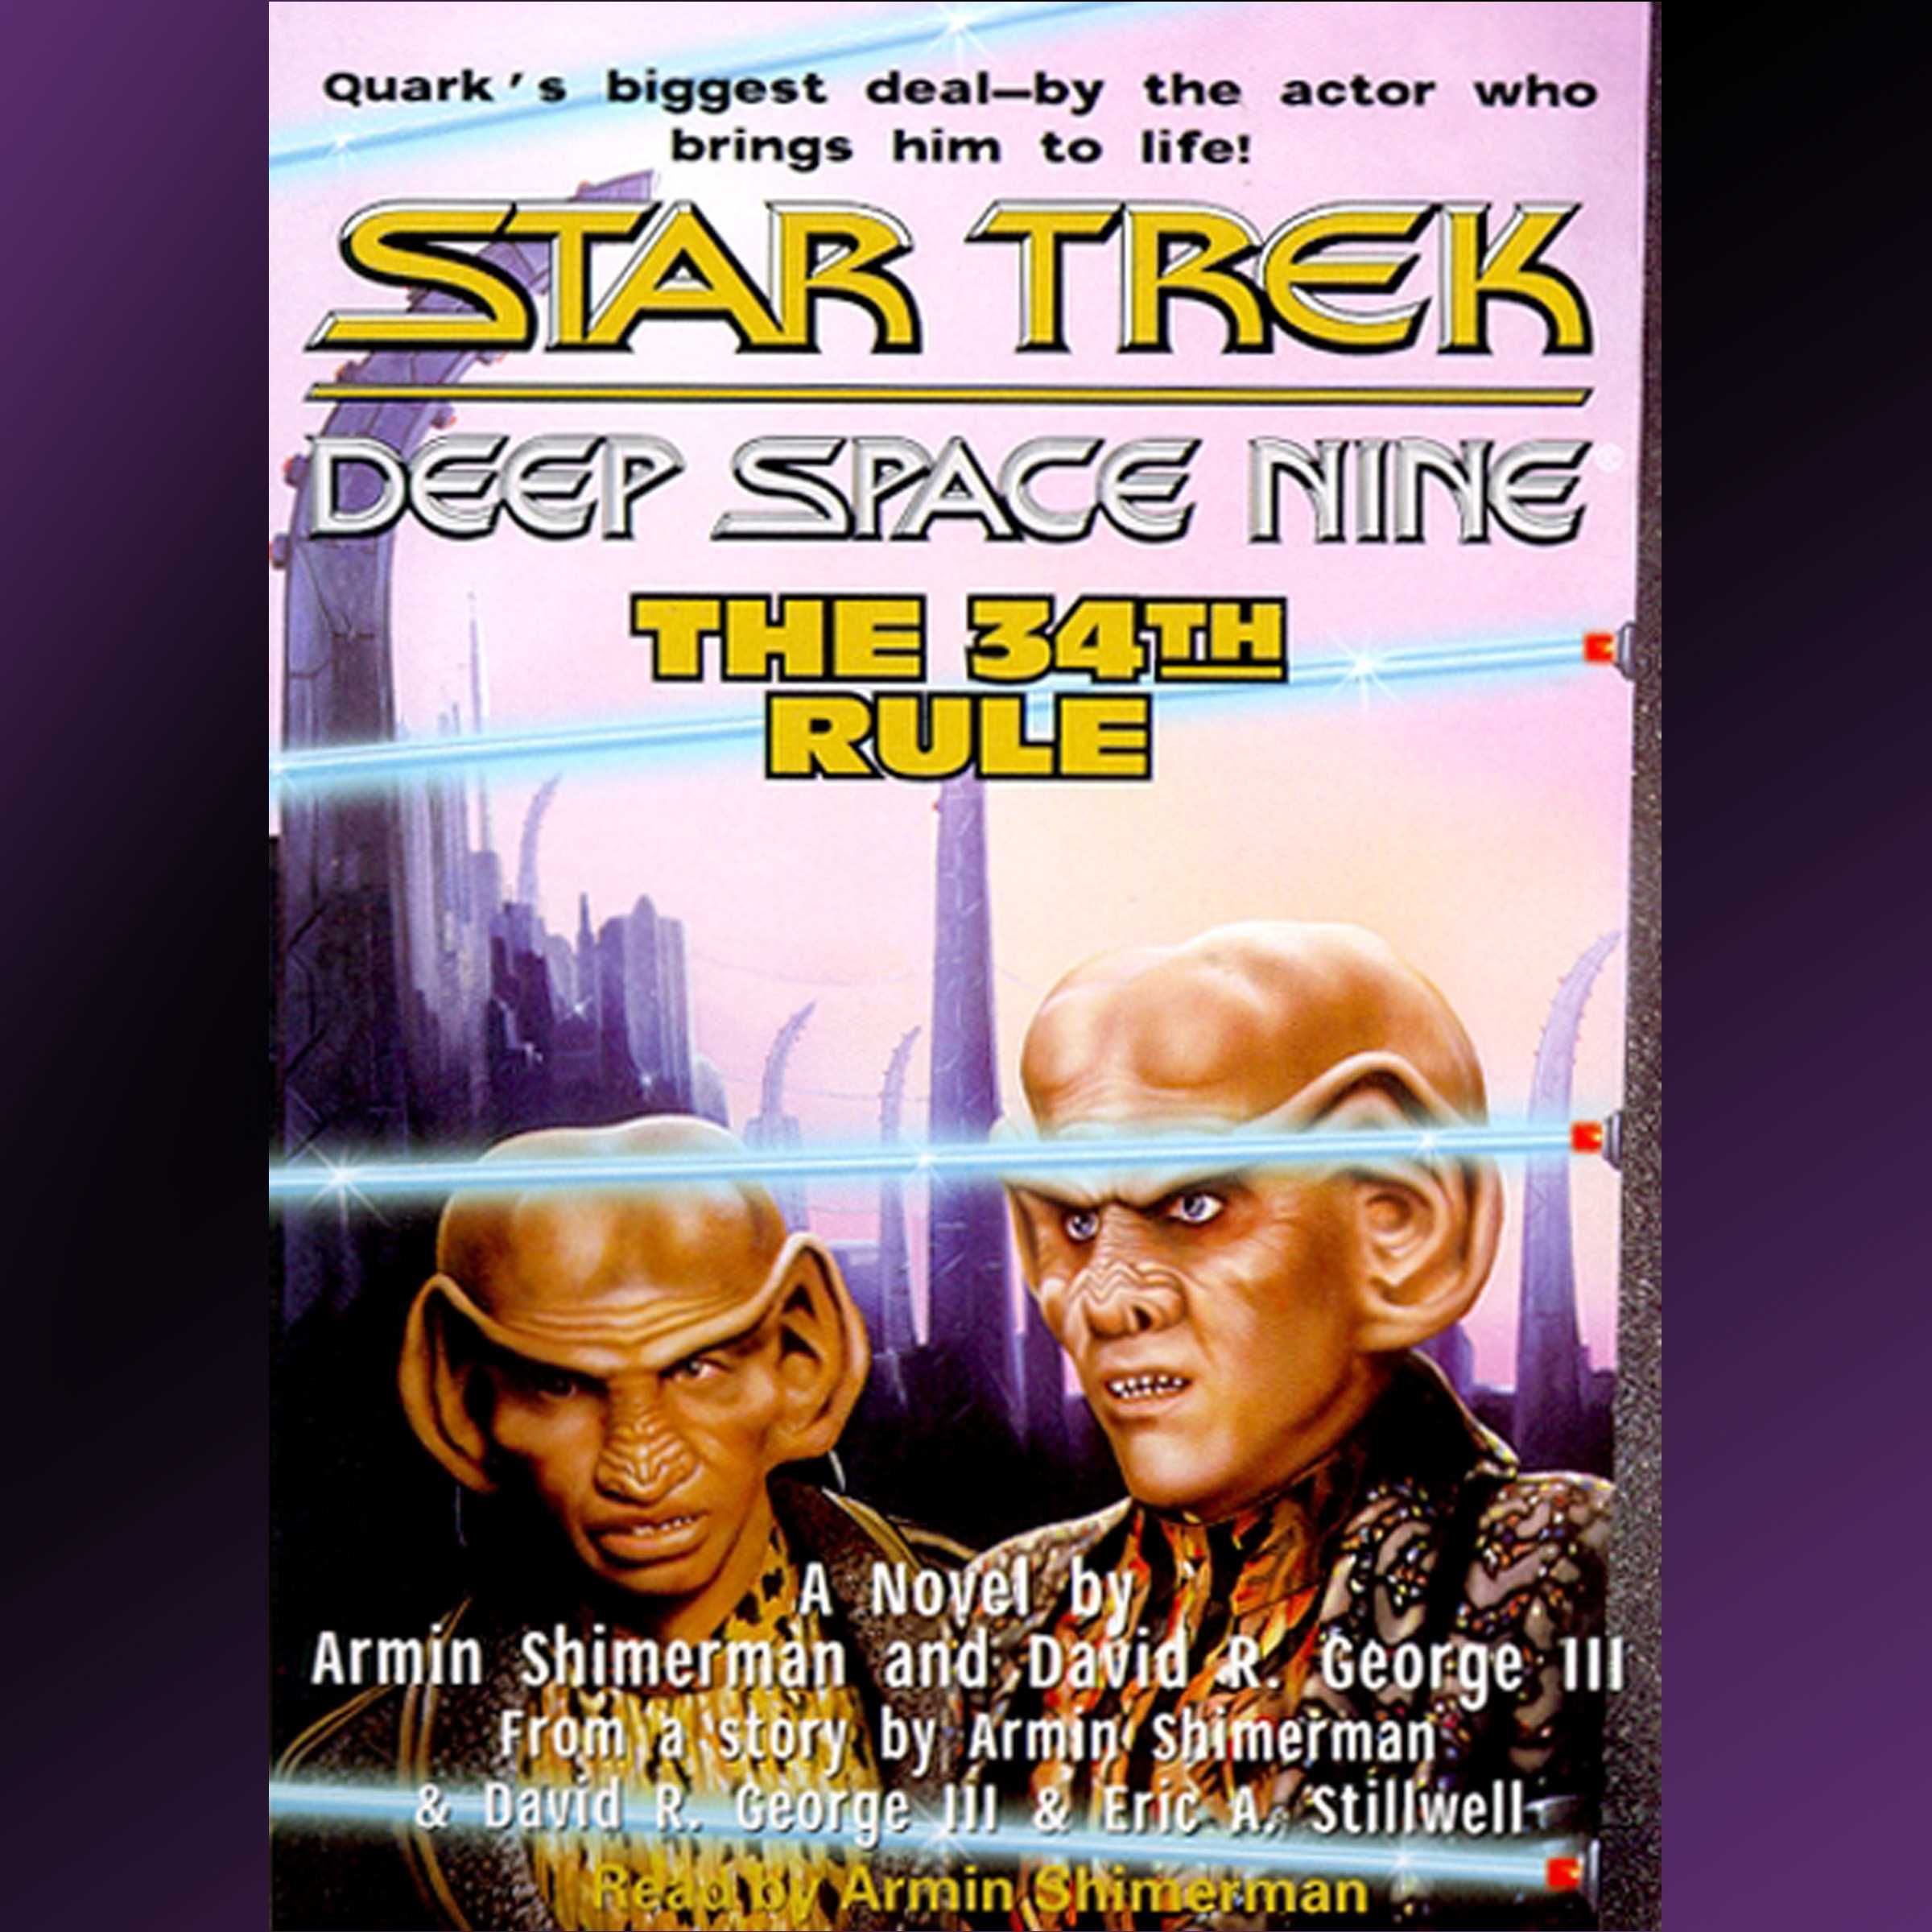 The star trek deep space nine the 34th rule 9780743546249 hr